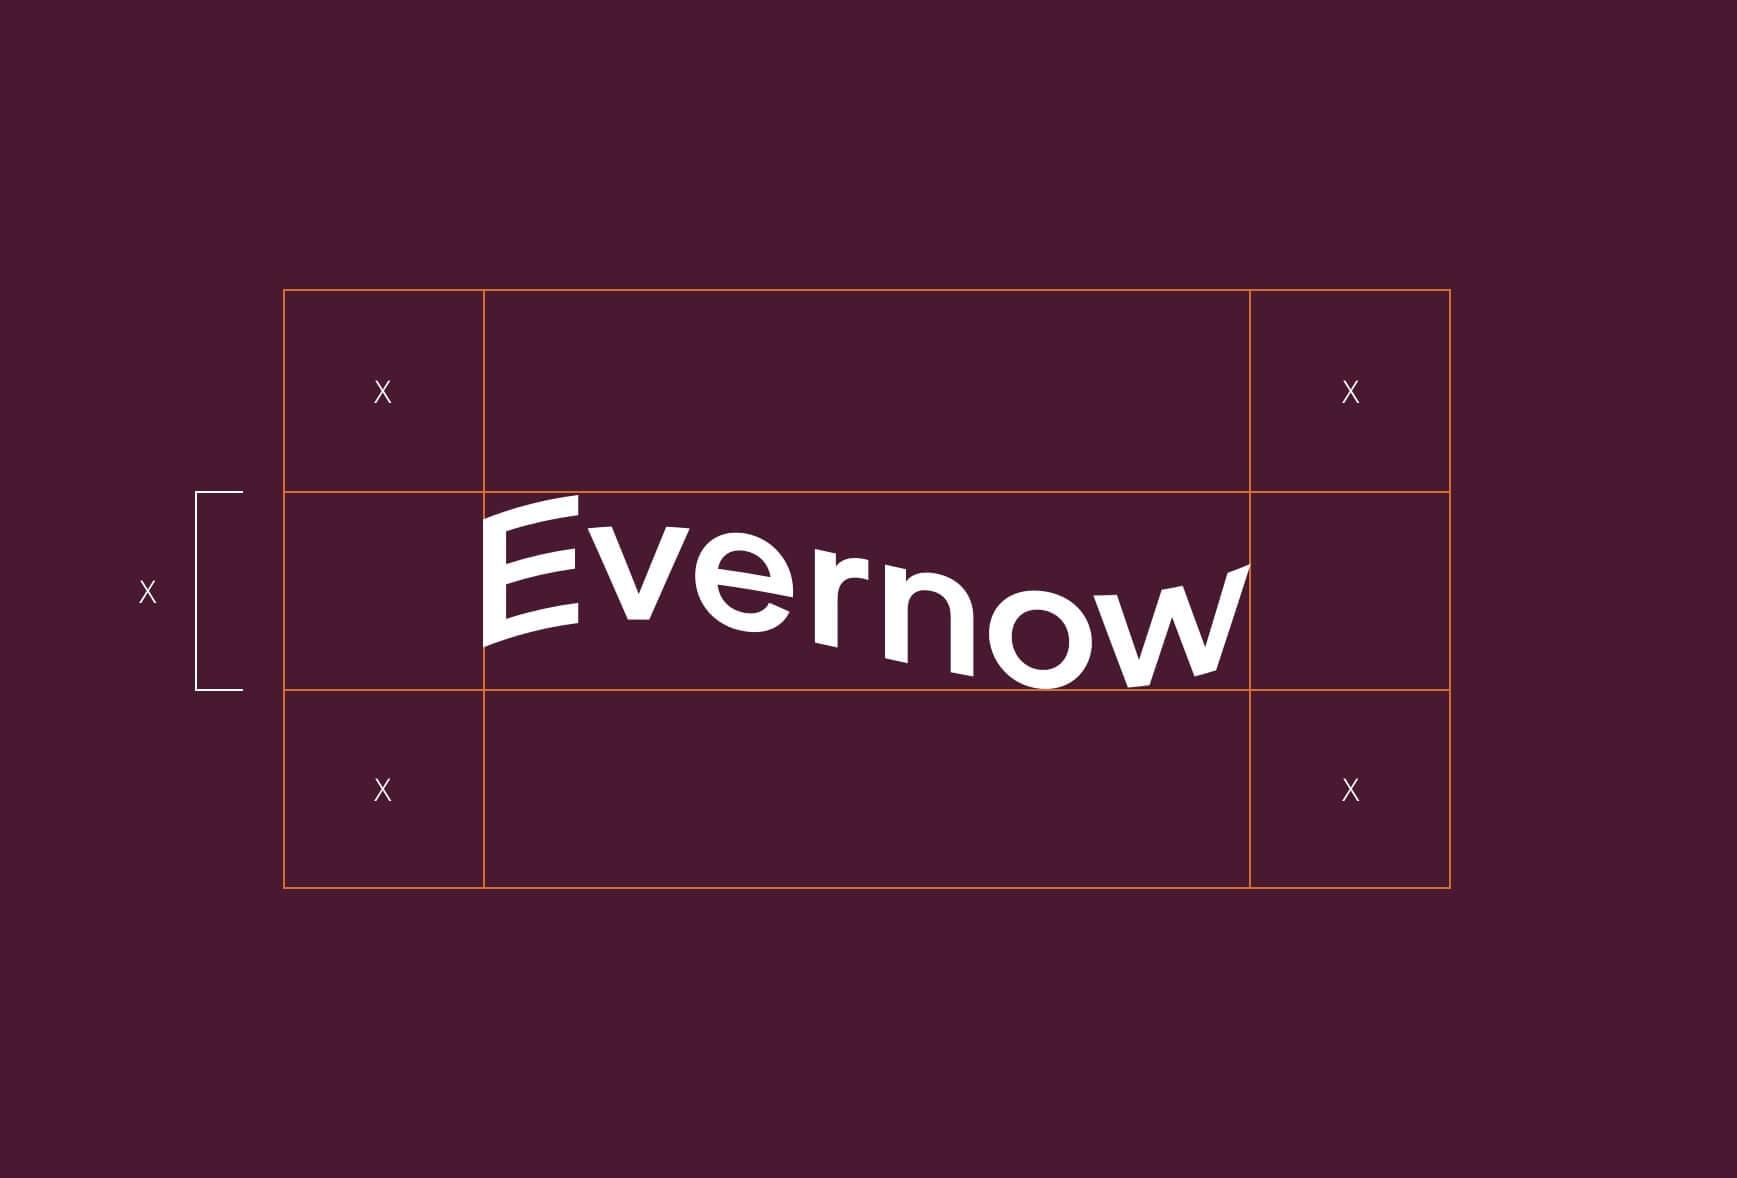 Evernow logo, a wavy shape.